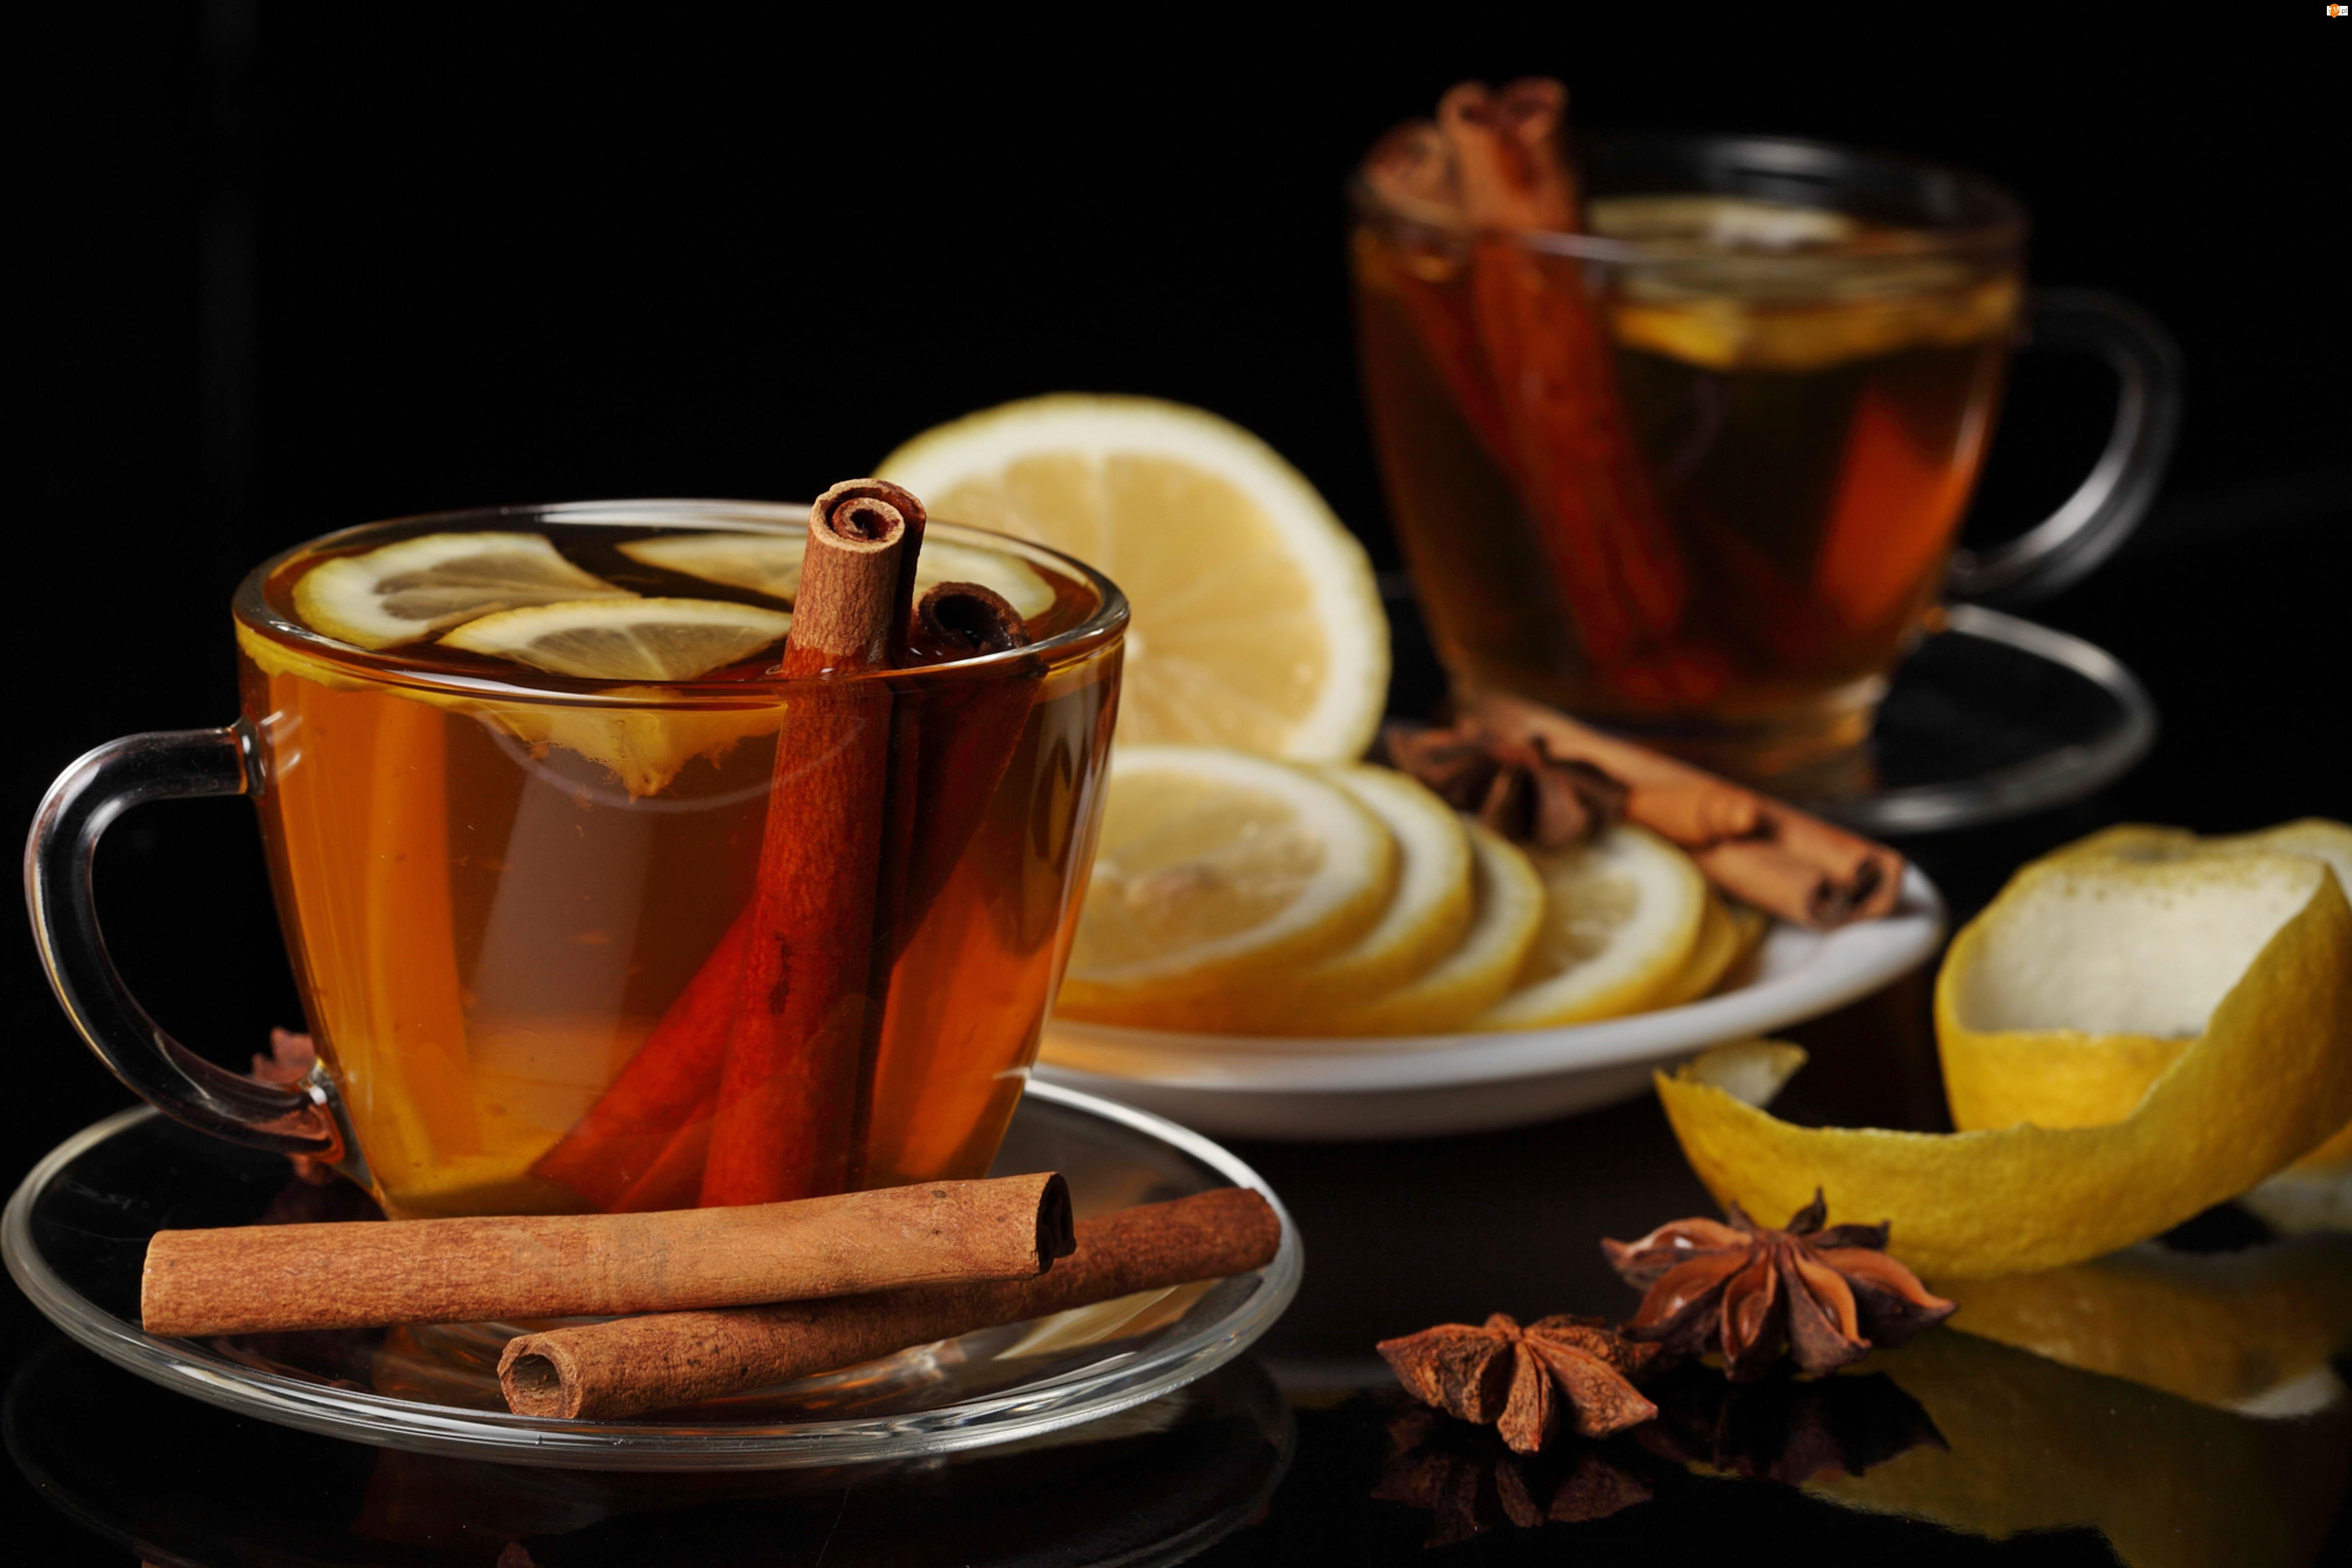 Rozmycie, Herbata, Karambola, Cynamon, Cytryna